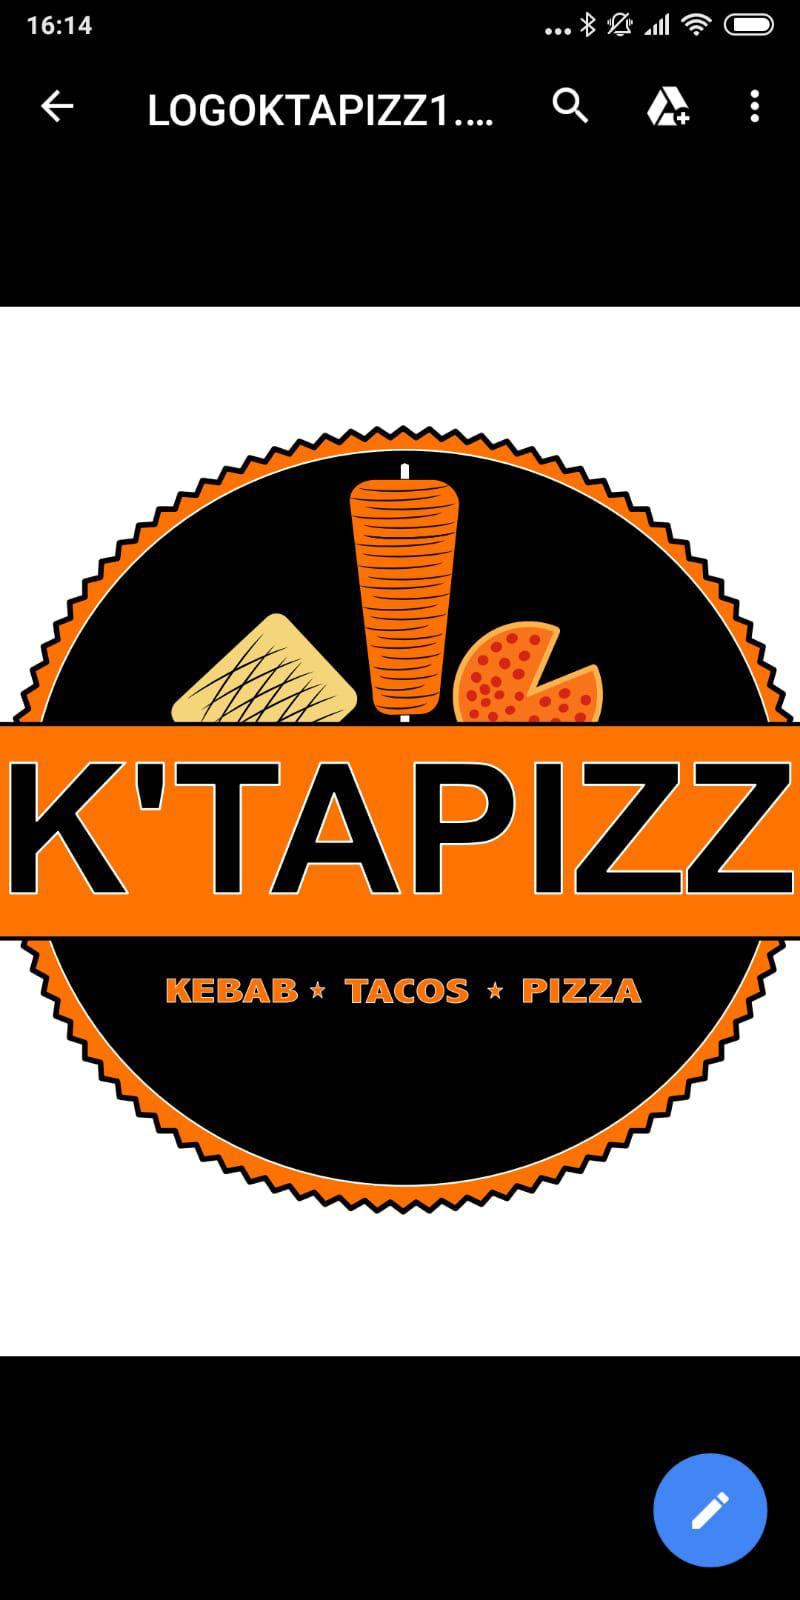 K'tapiz restaurant